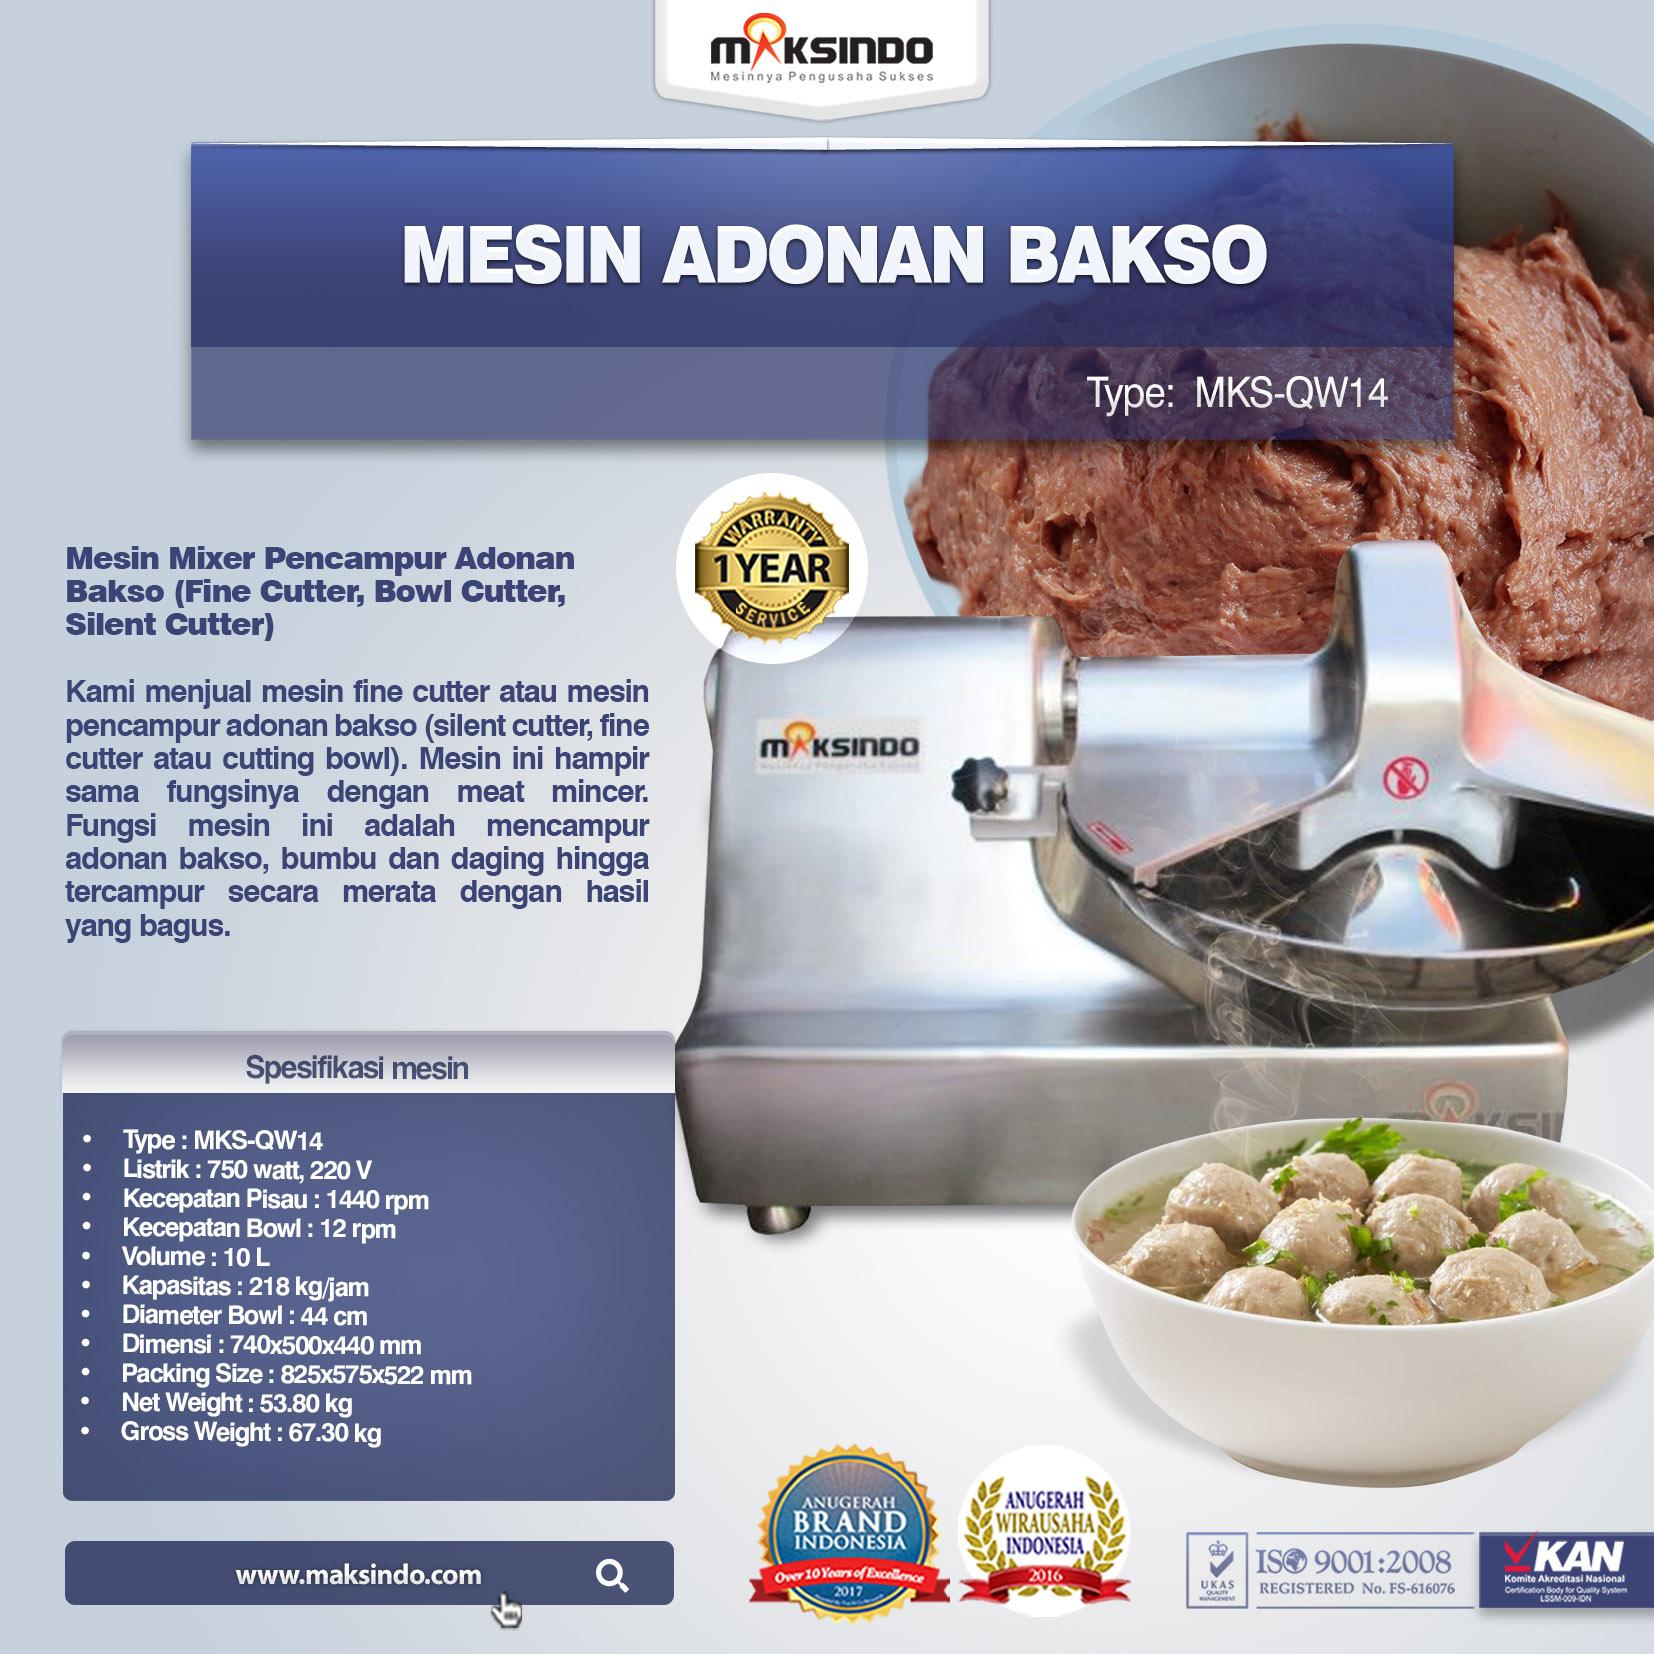 Mesin Adonan Bakso MKS-QW14